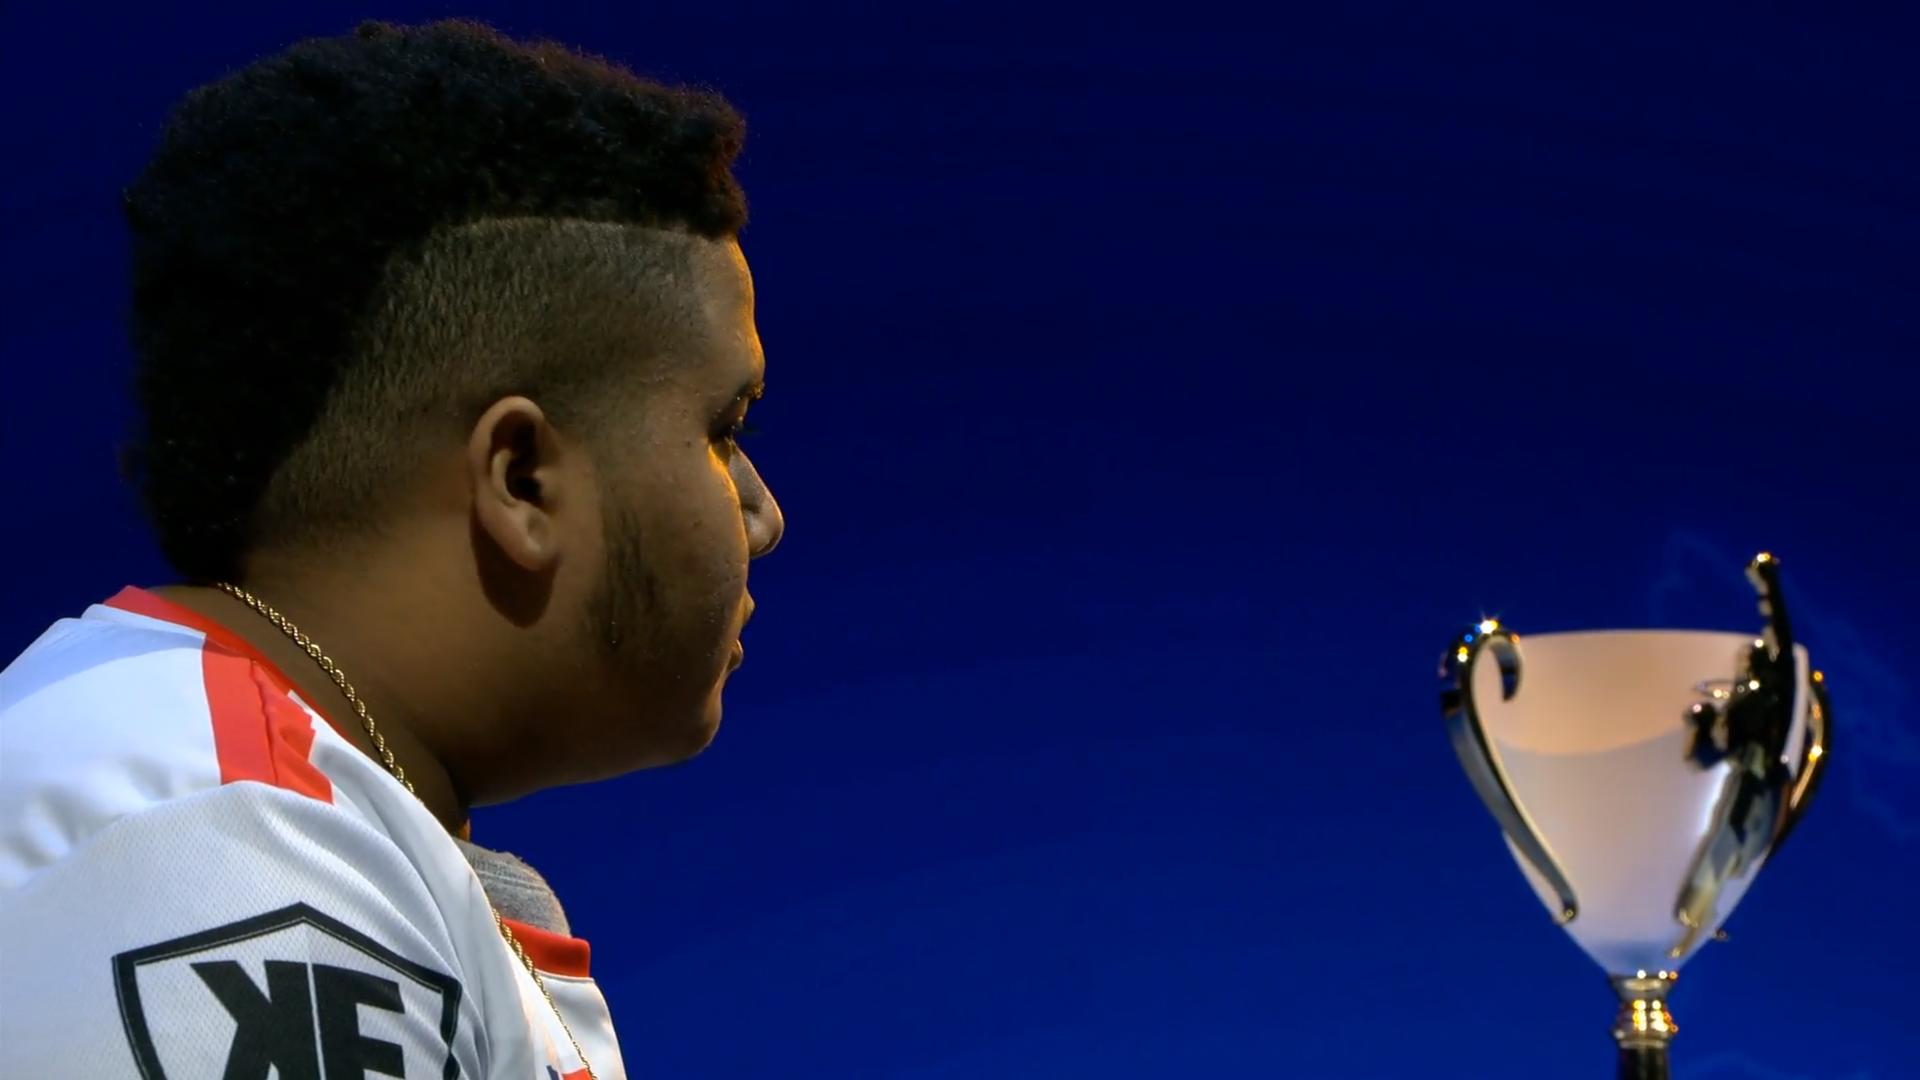 Saul Mena Takes Down Evo Champ To Win $332K Capcom Cup